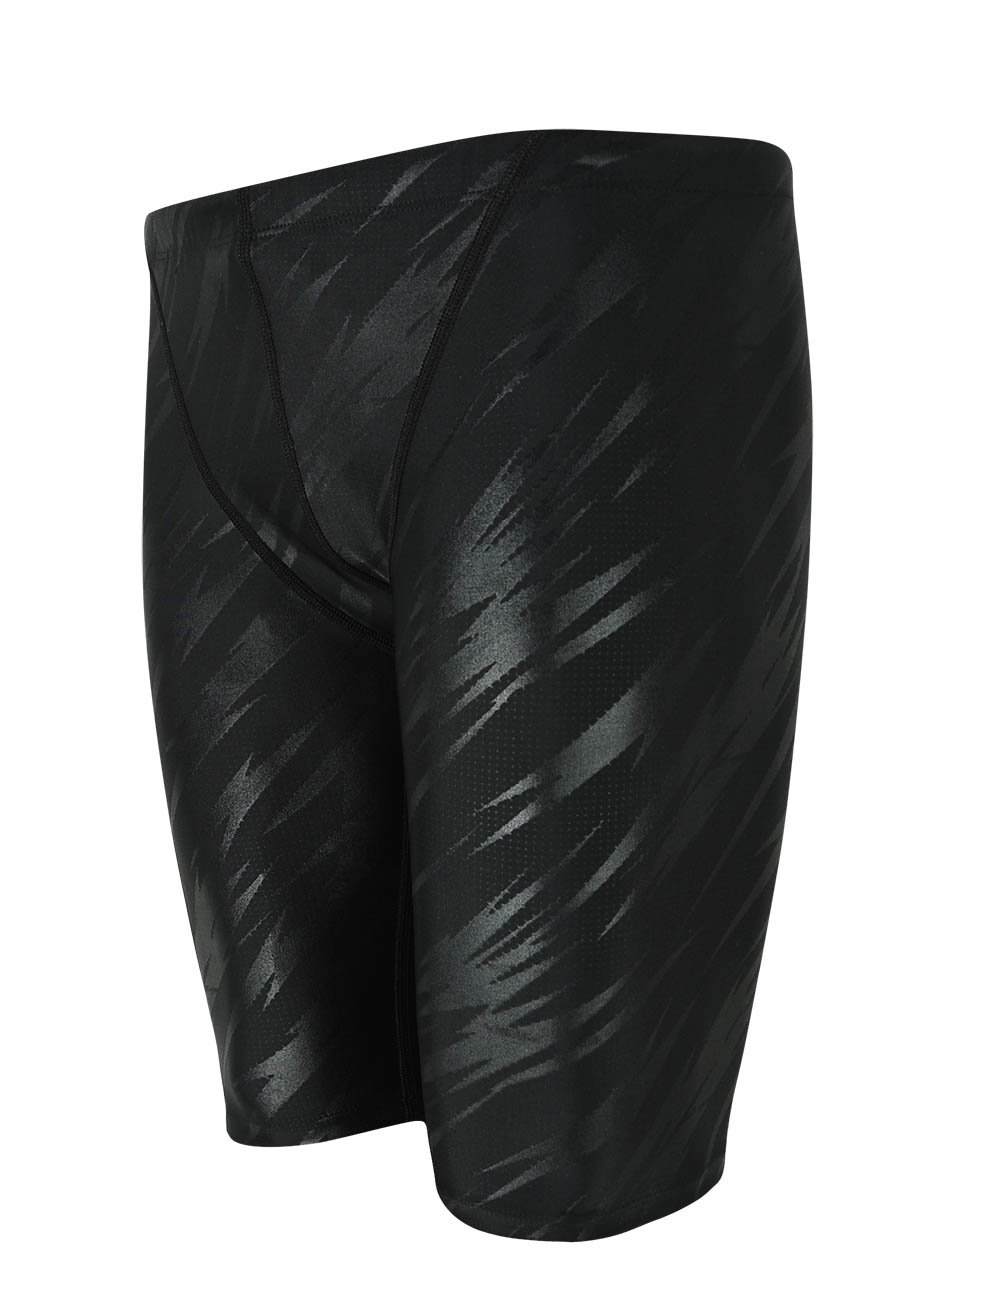 Easea Men`s Rapid Swim Splice Quick Dry Jammer Swimsuit Black Pattern 2X-Large by Easea